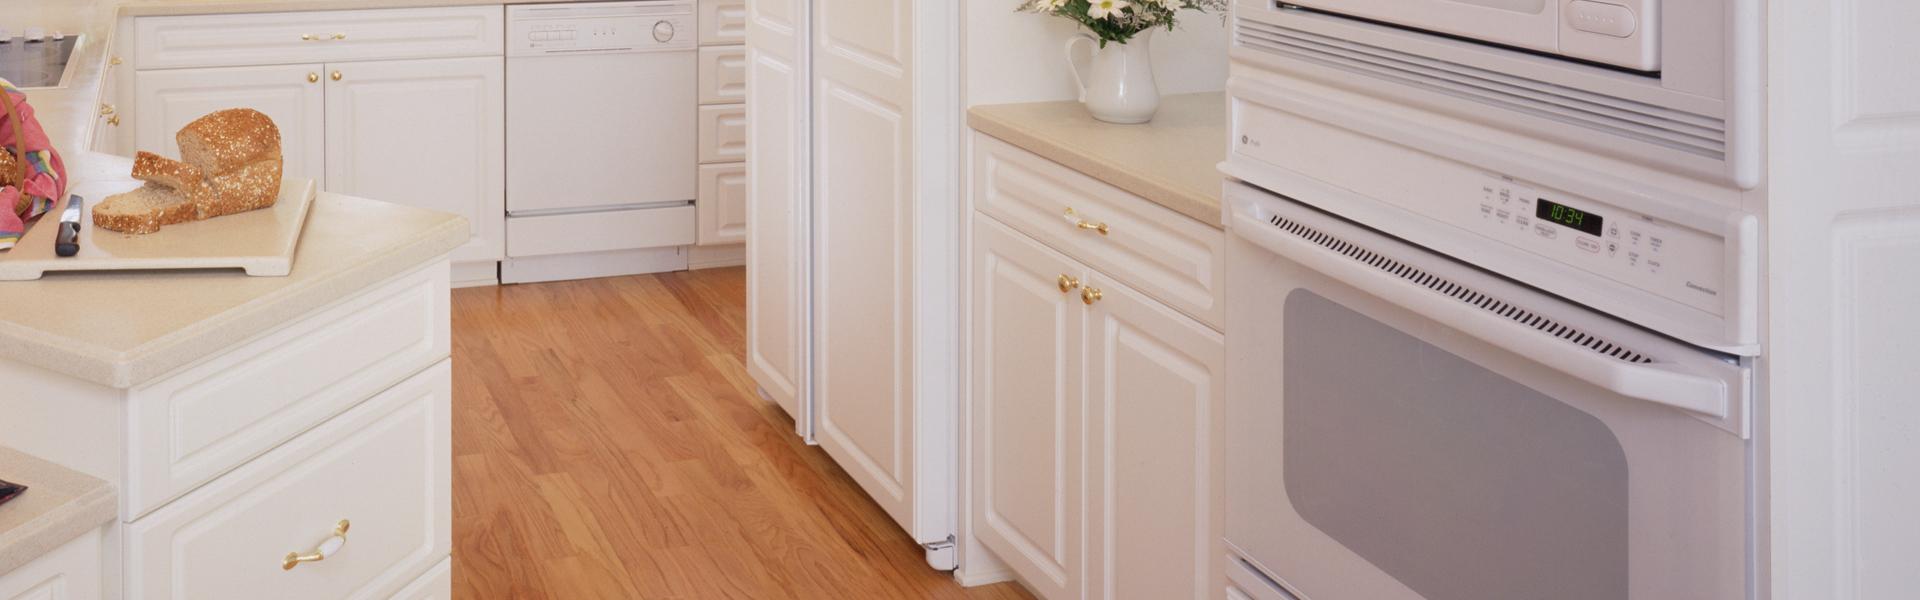 Frameless Cabinet Style